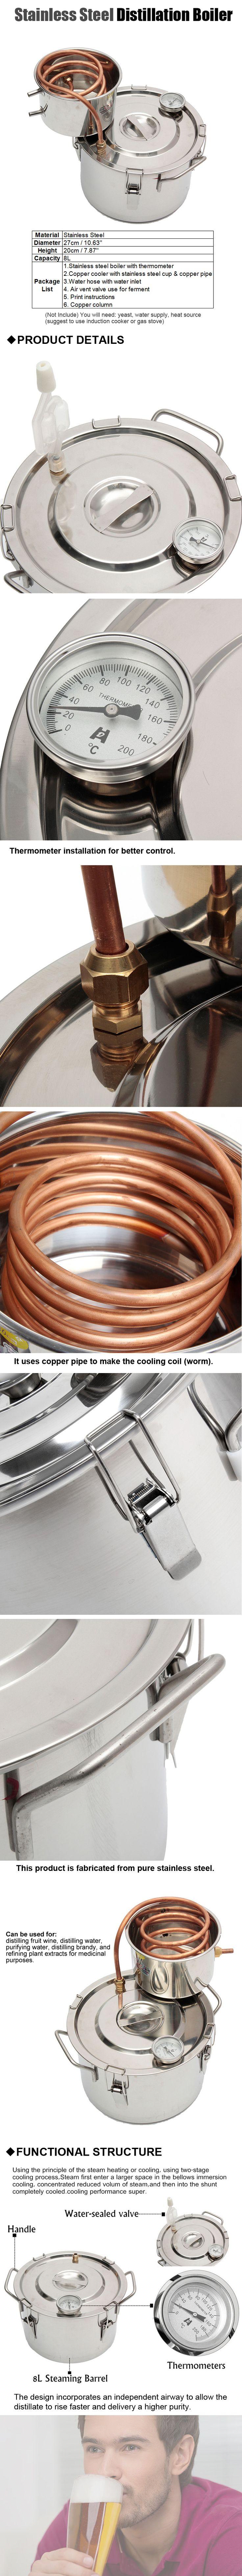 2GAL/8L Copper Ethanol Water Alcohol Distiller Moonshine Still Stainless Steel Distillation Boiler